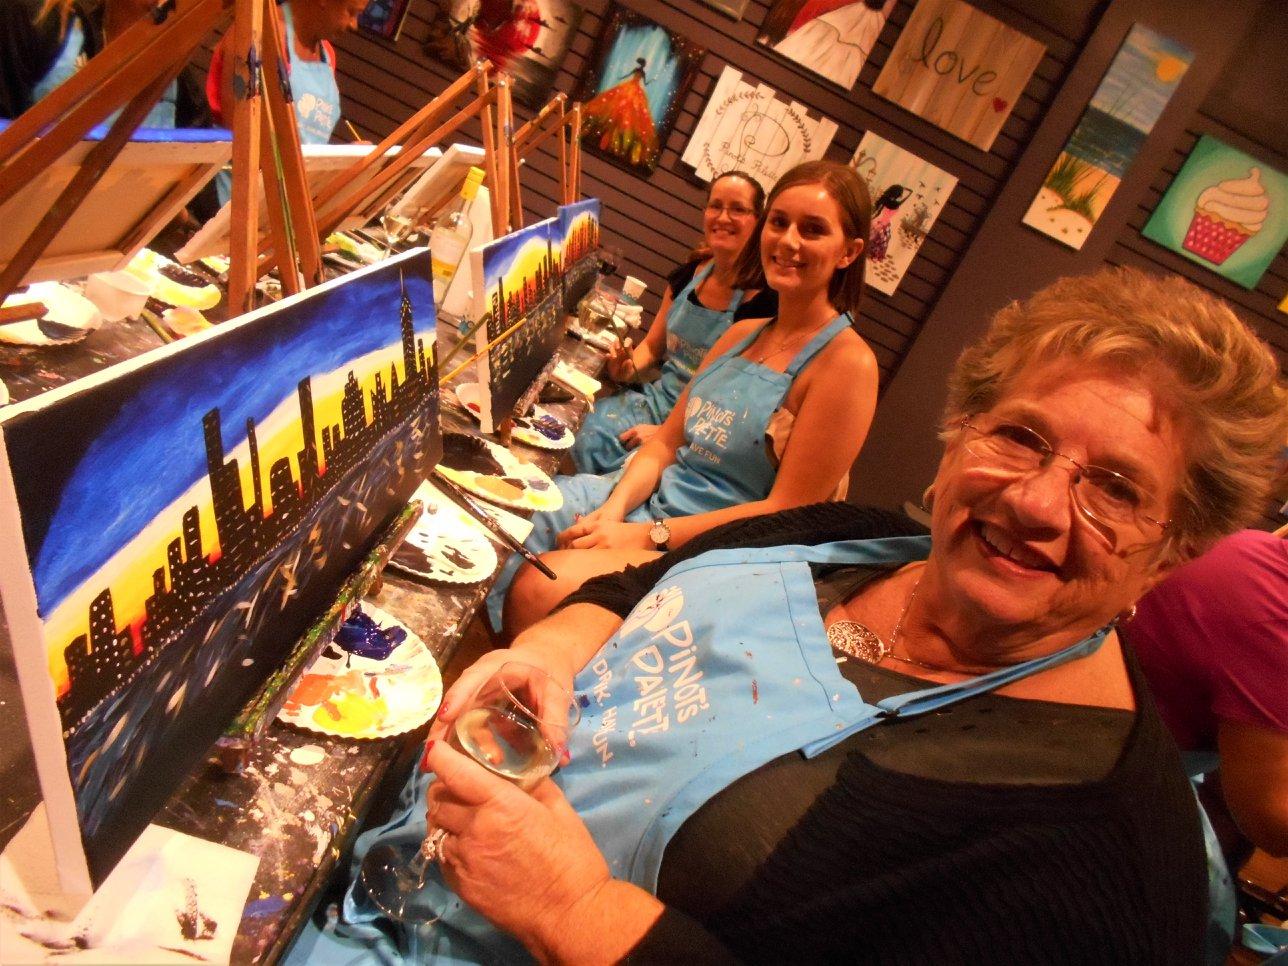 art classes in Wayne NJ for retirees